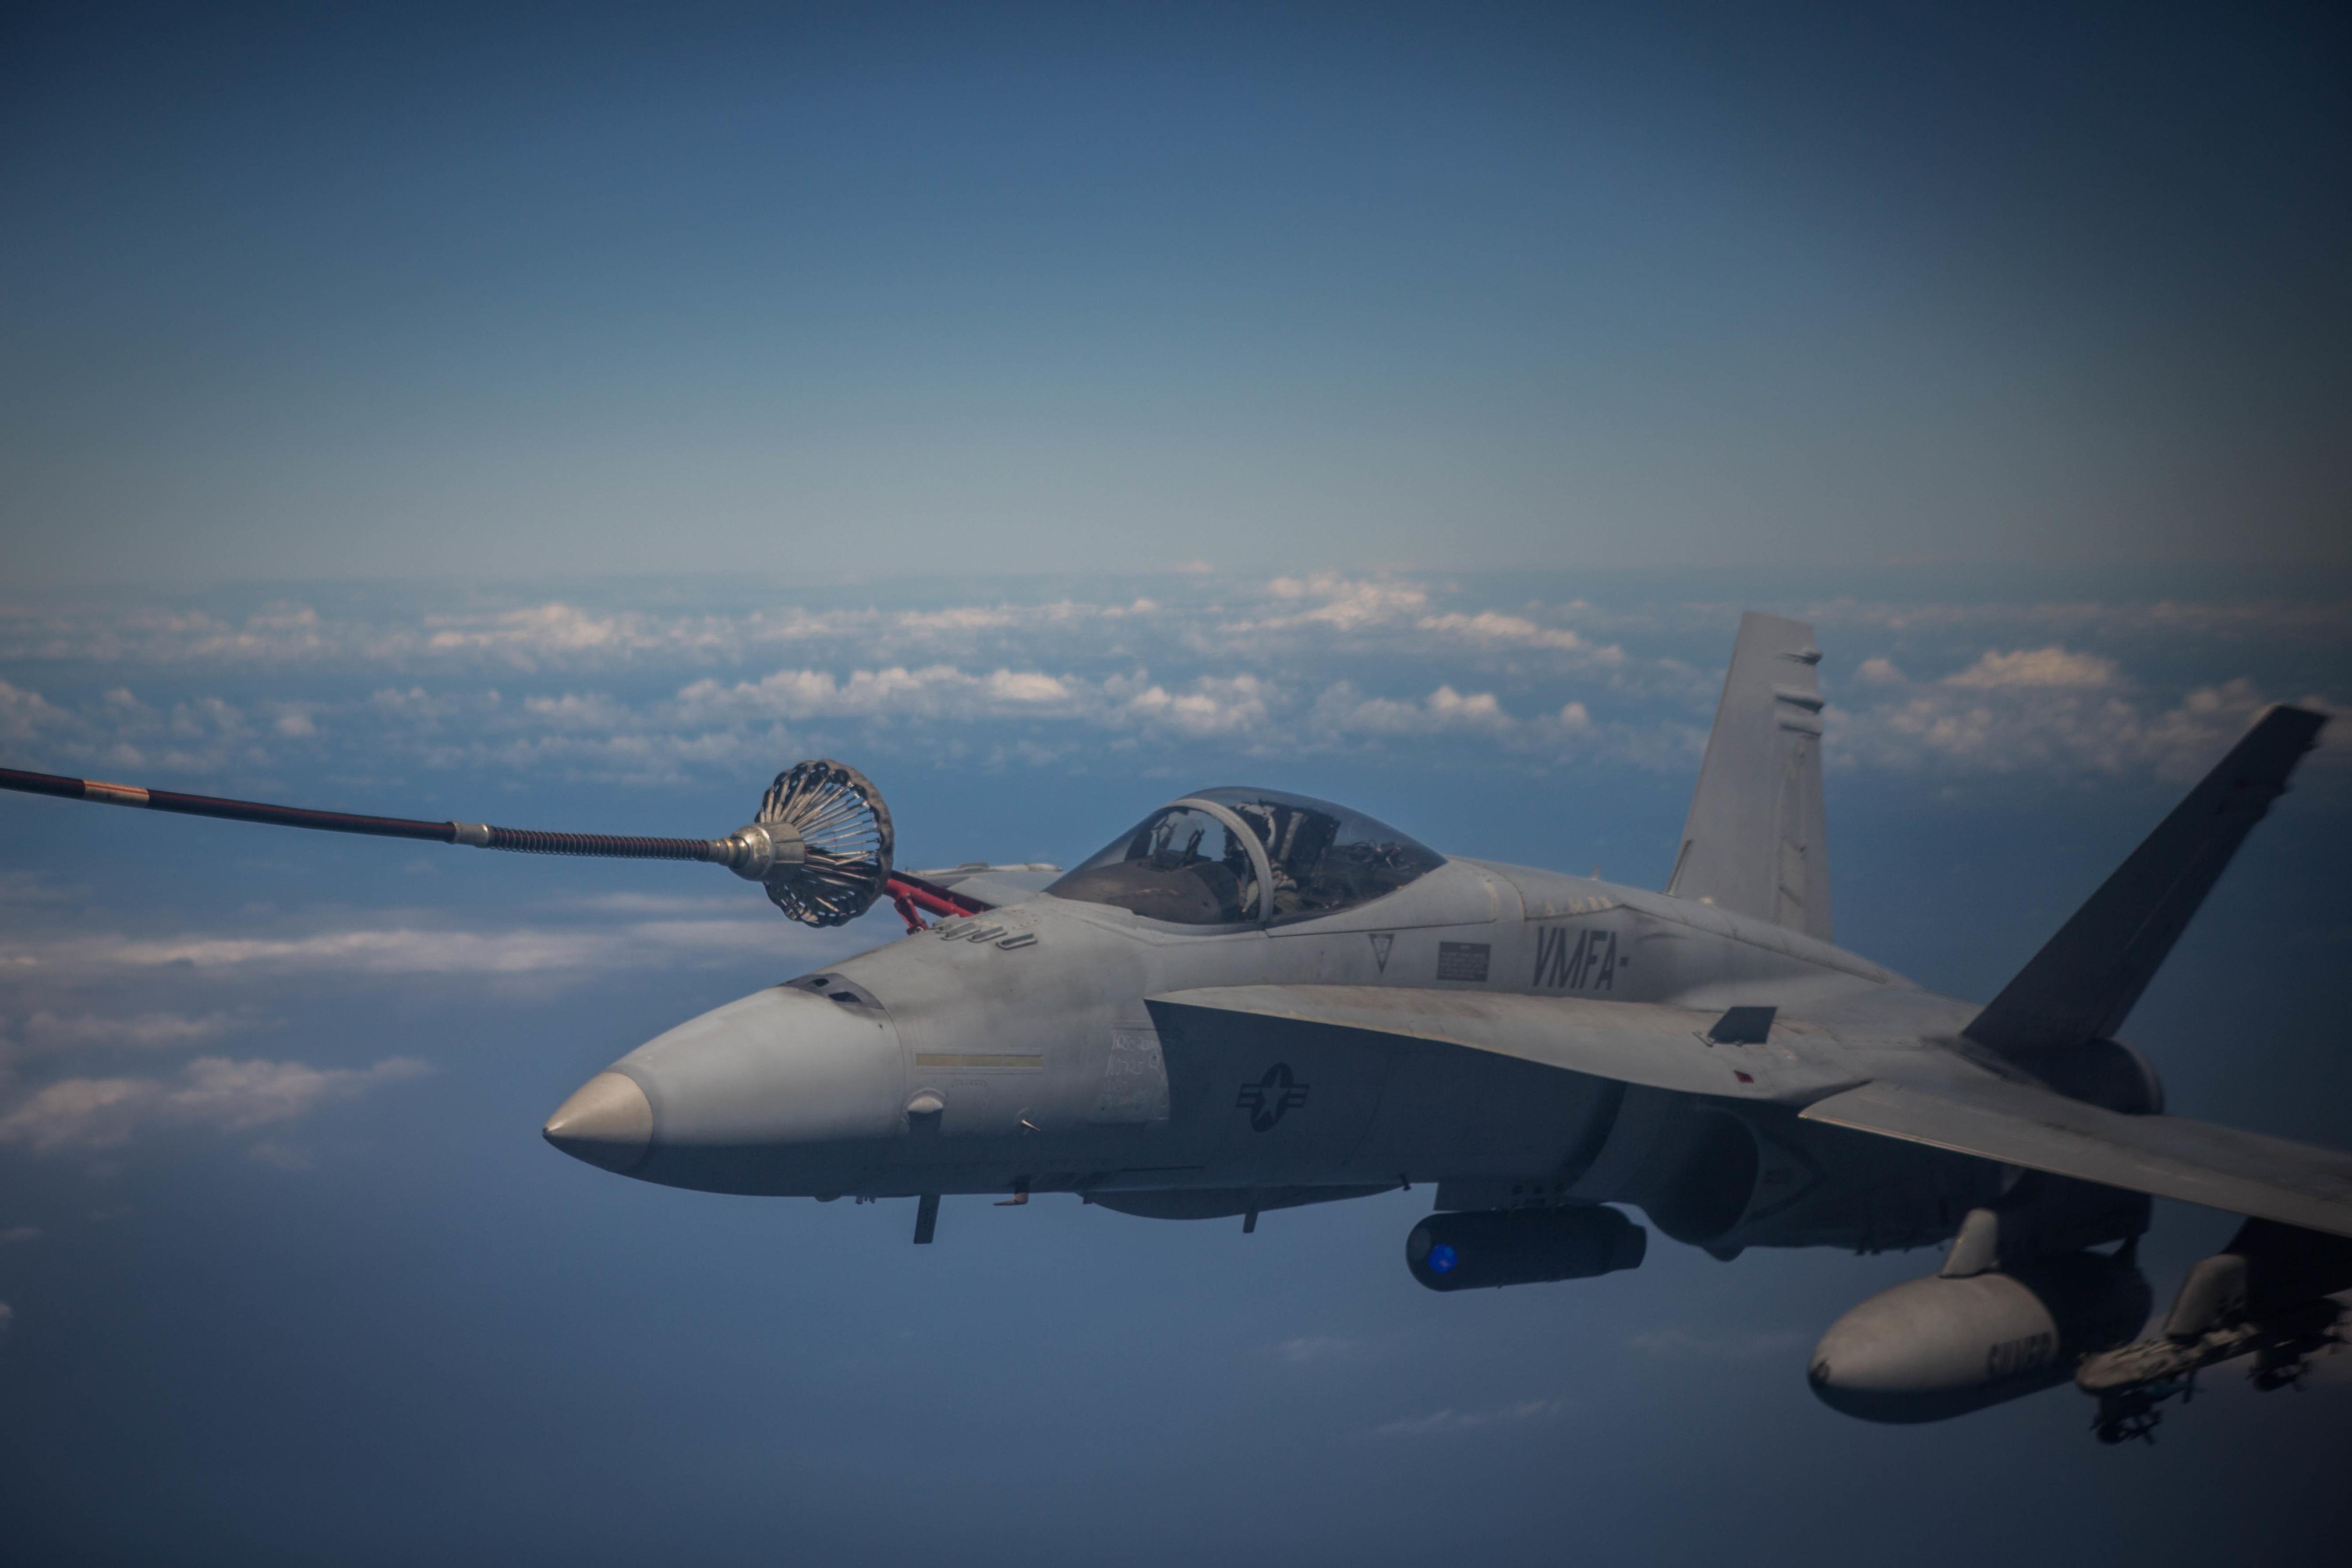 Marine Aviation op-ed 2